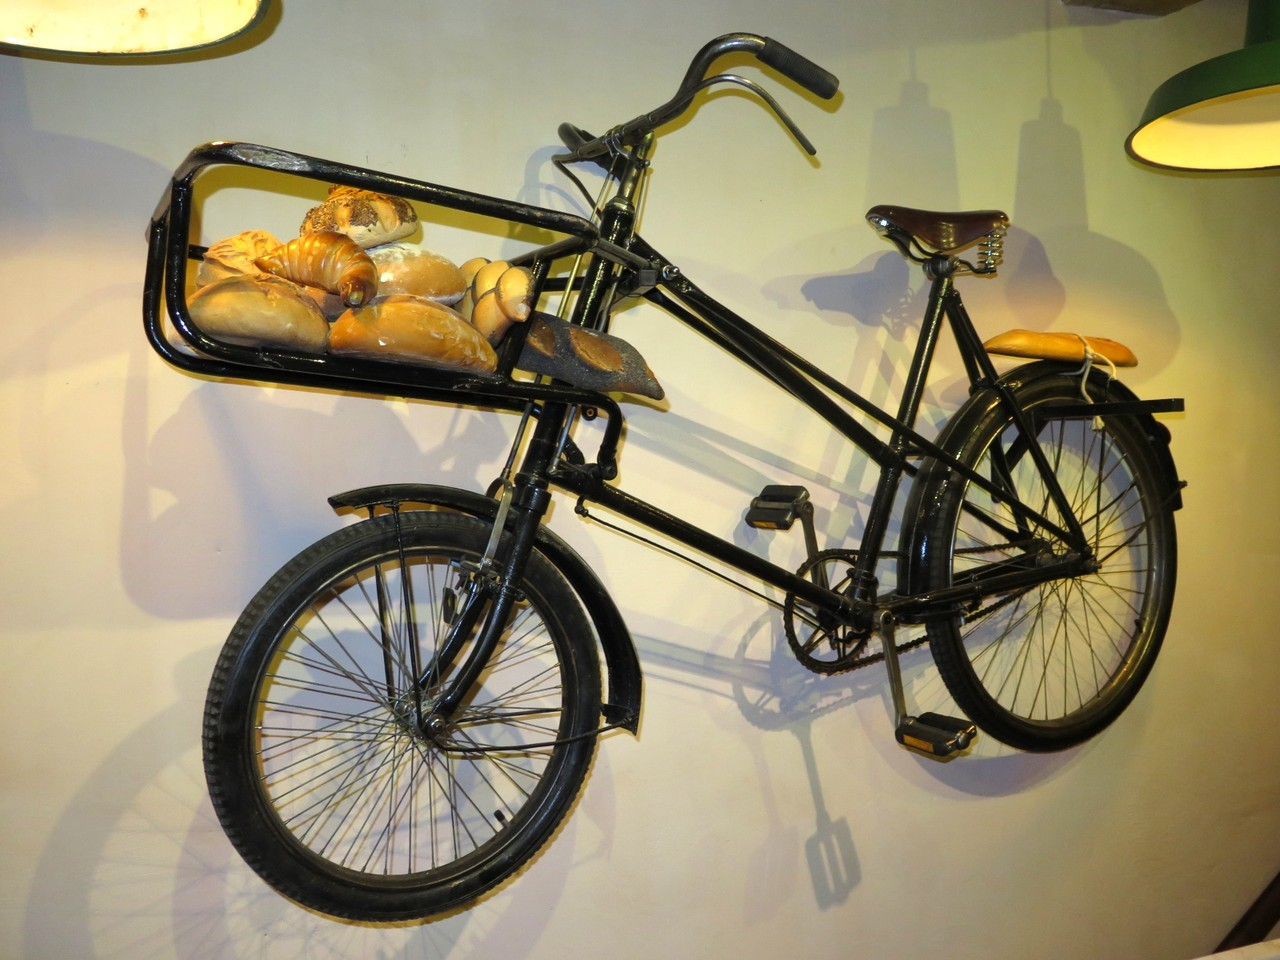 A bicicleta d'A PADARIA PORTUGUESA… pendurada na parede